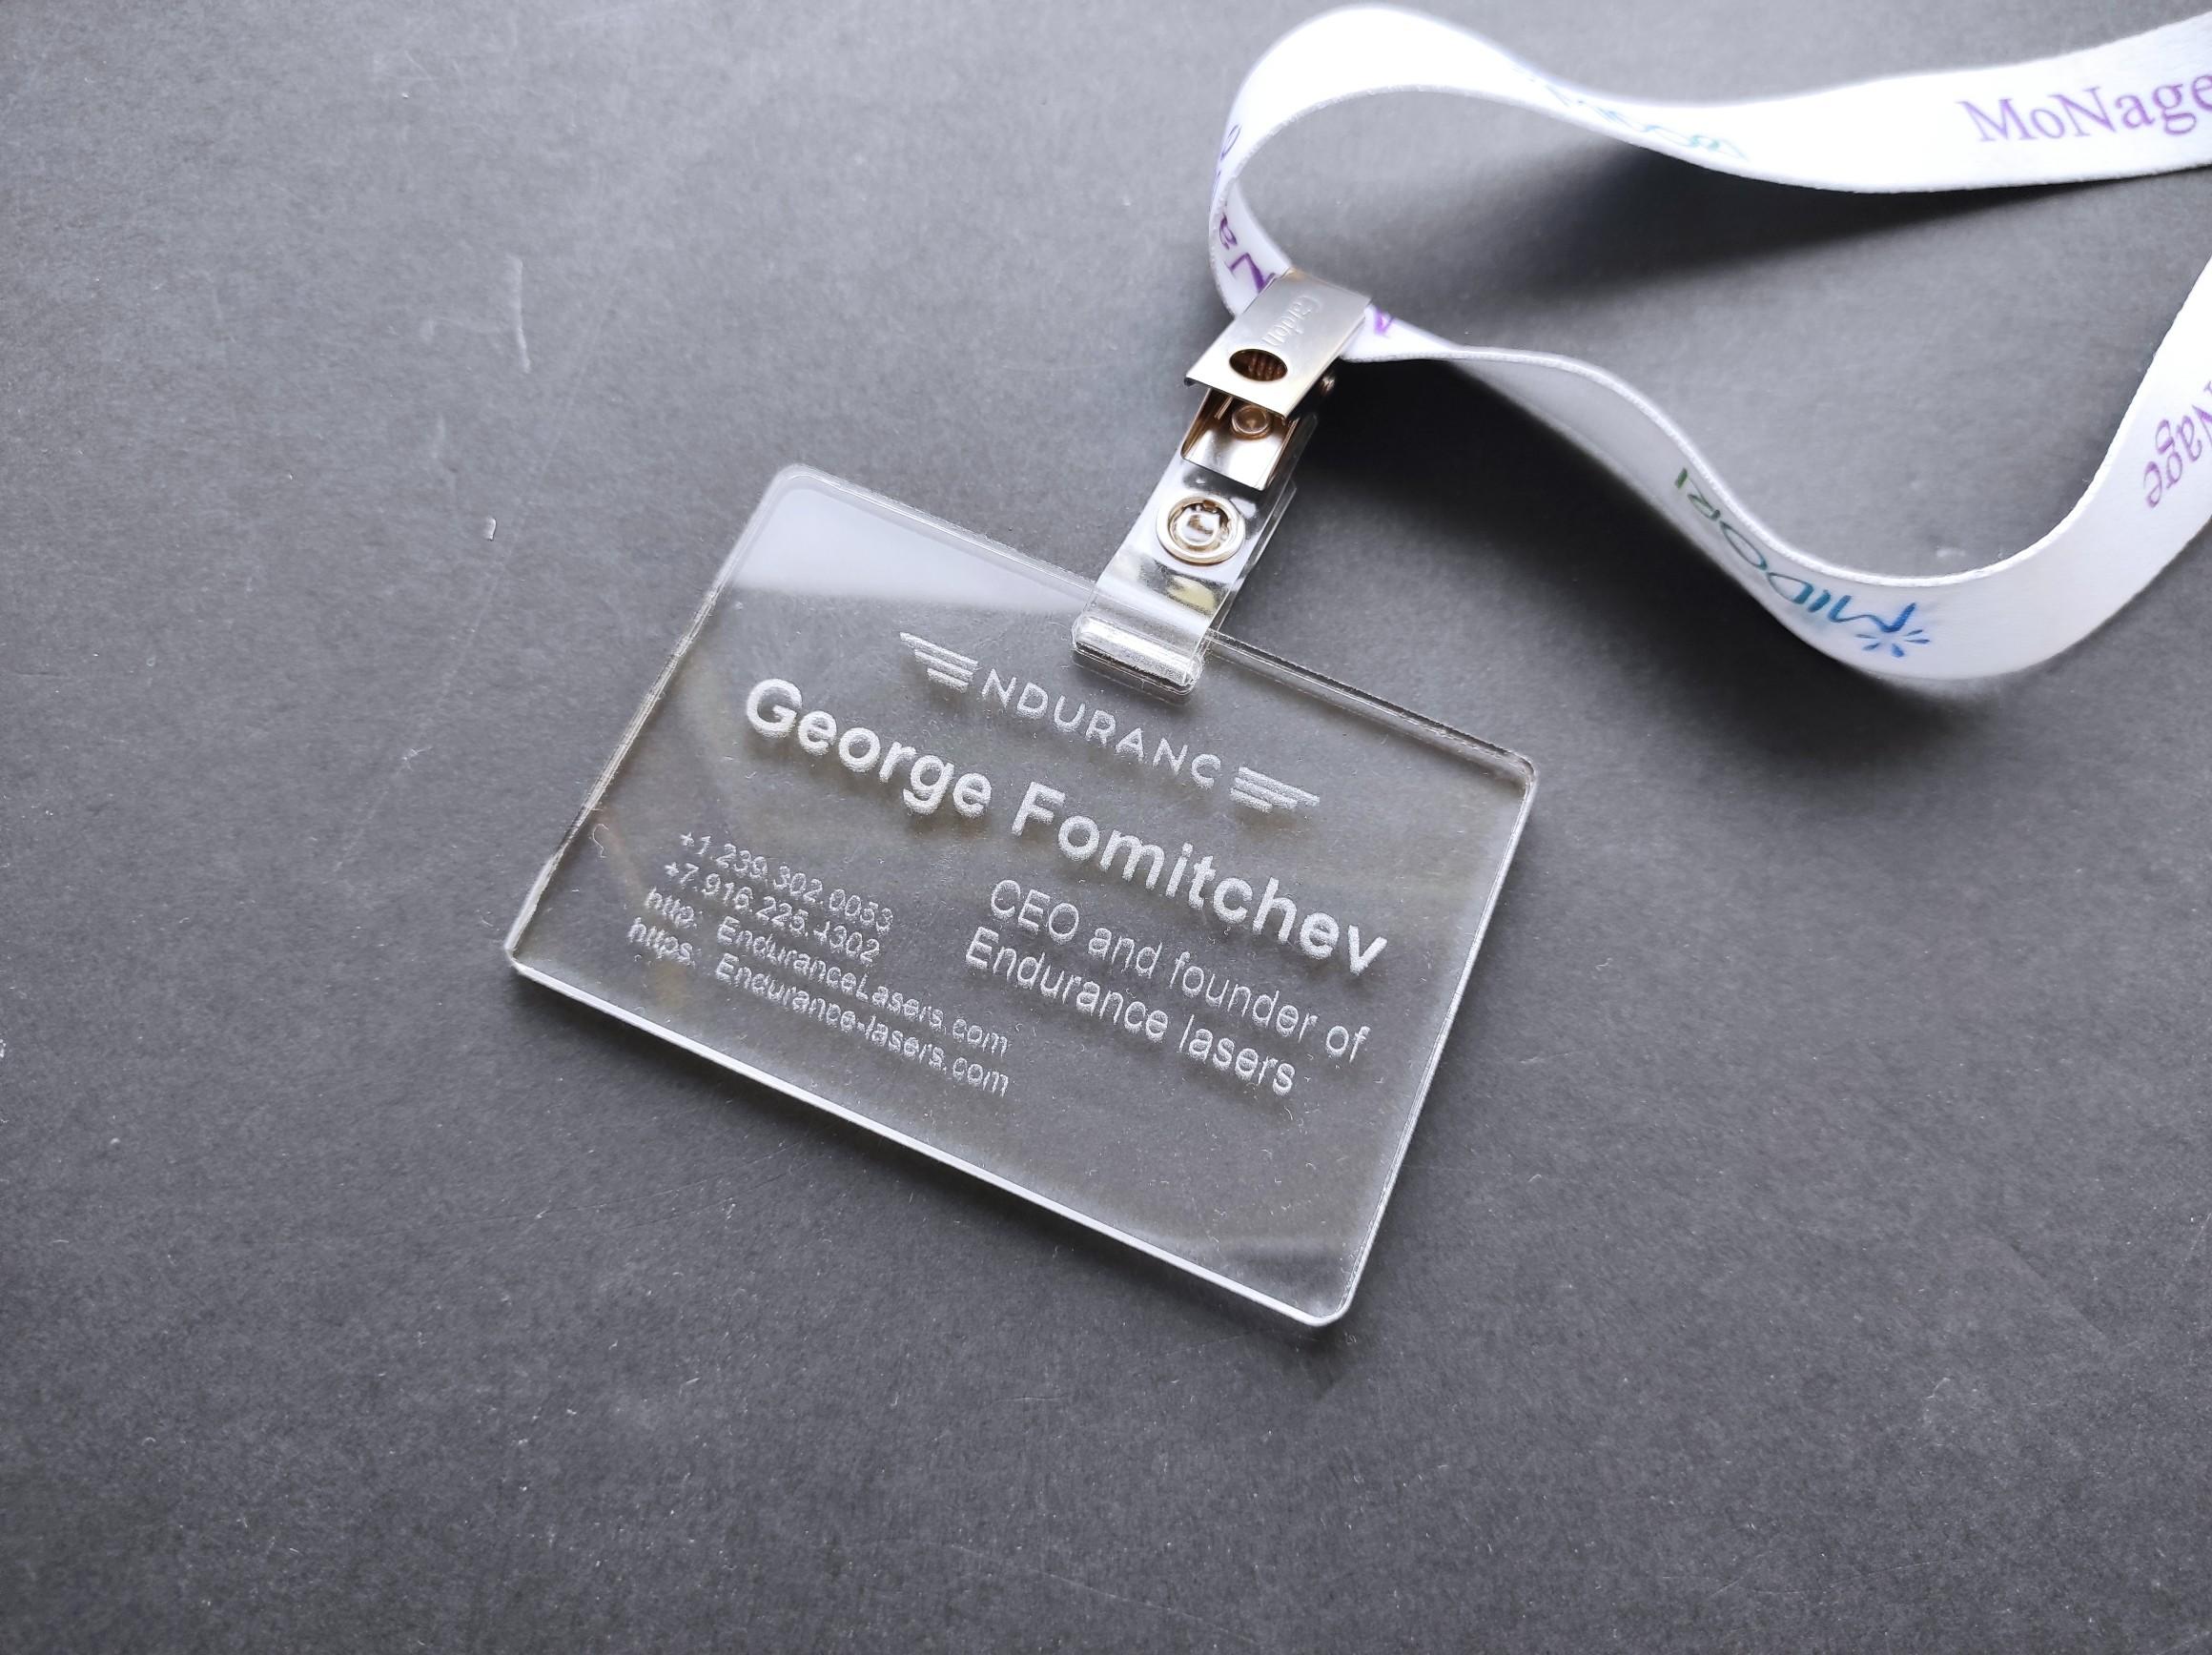 Trasparent acrylic badge